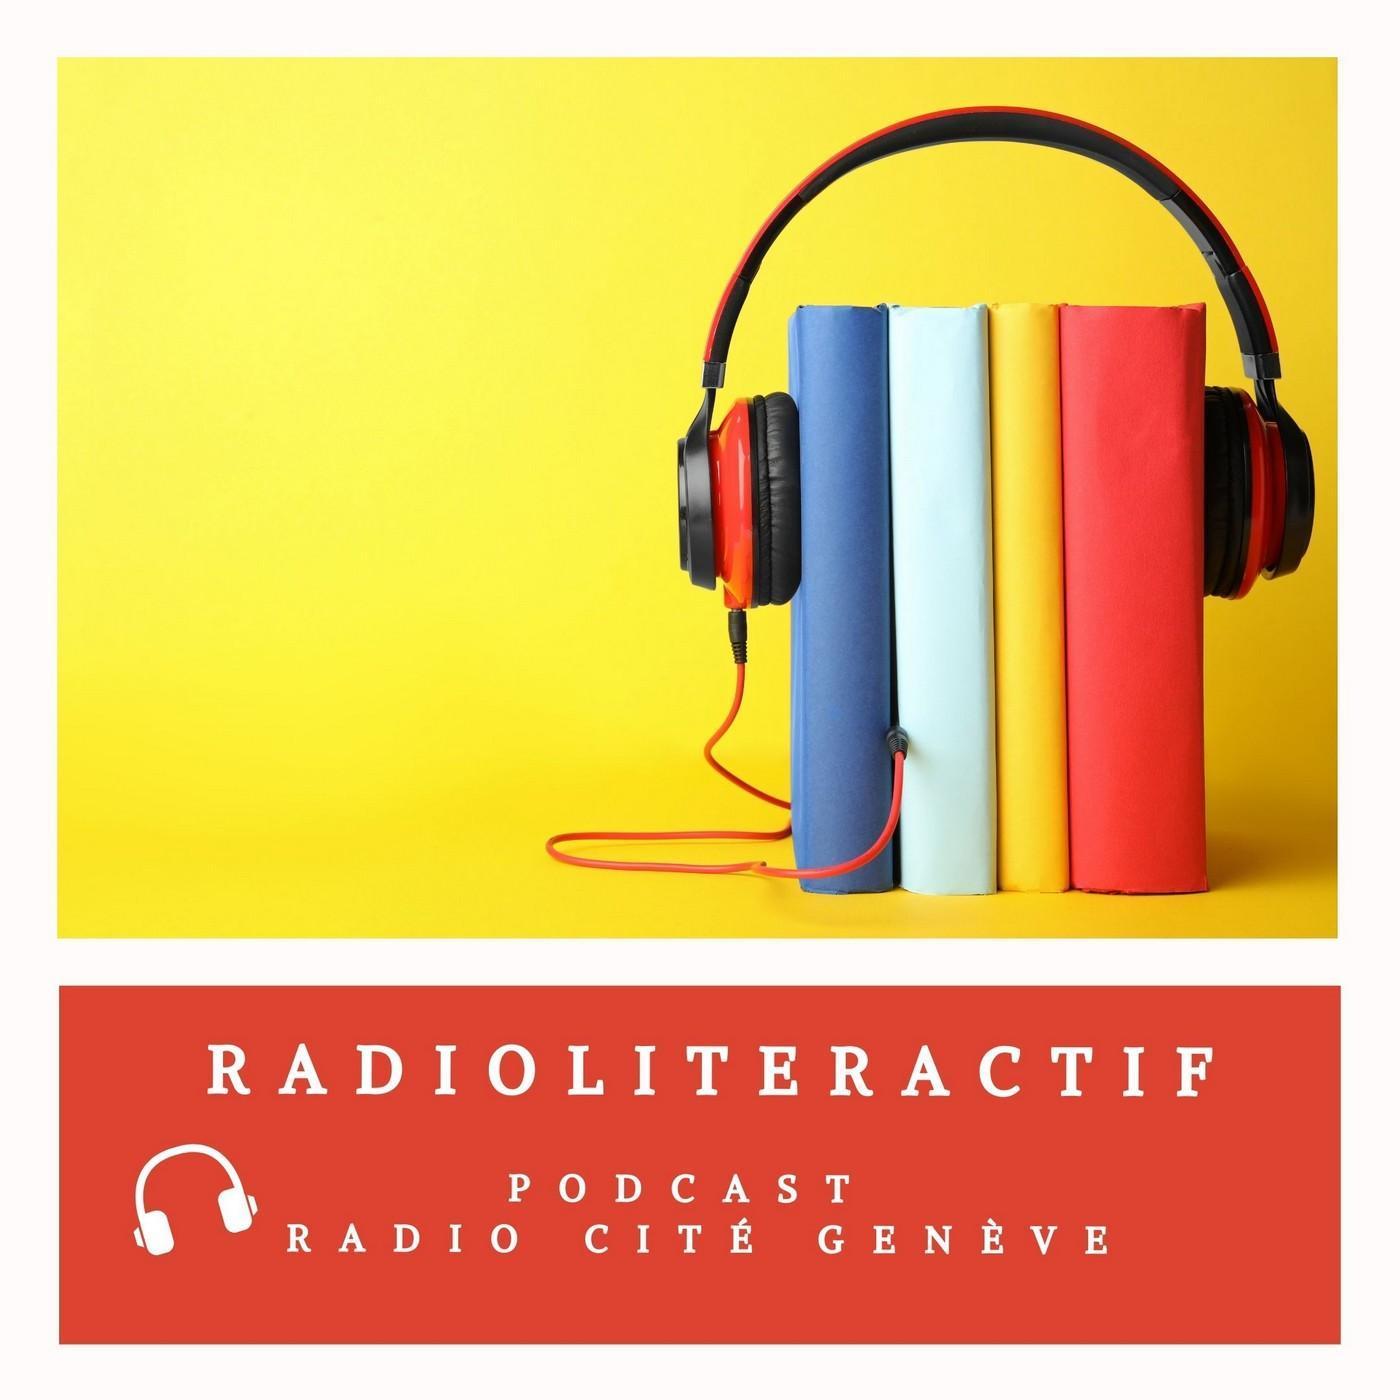 Radioliteractif du 28/06/2021 - Narcisse